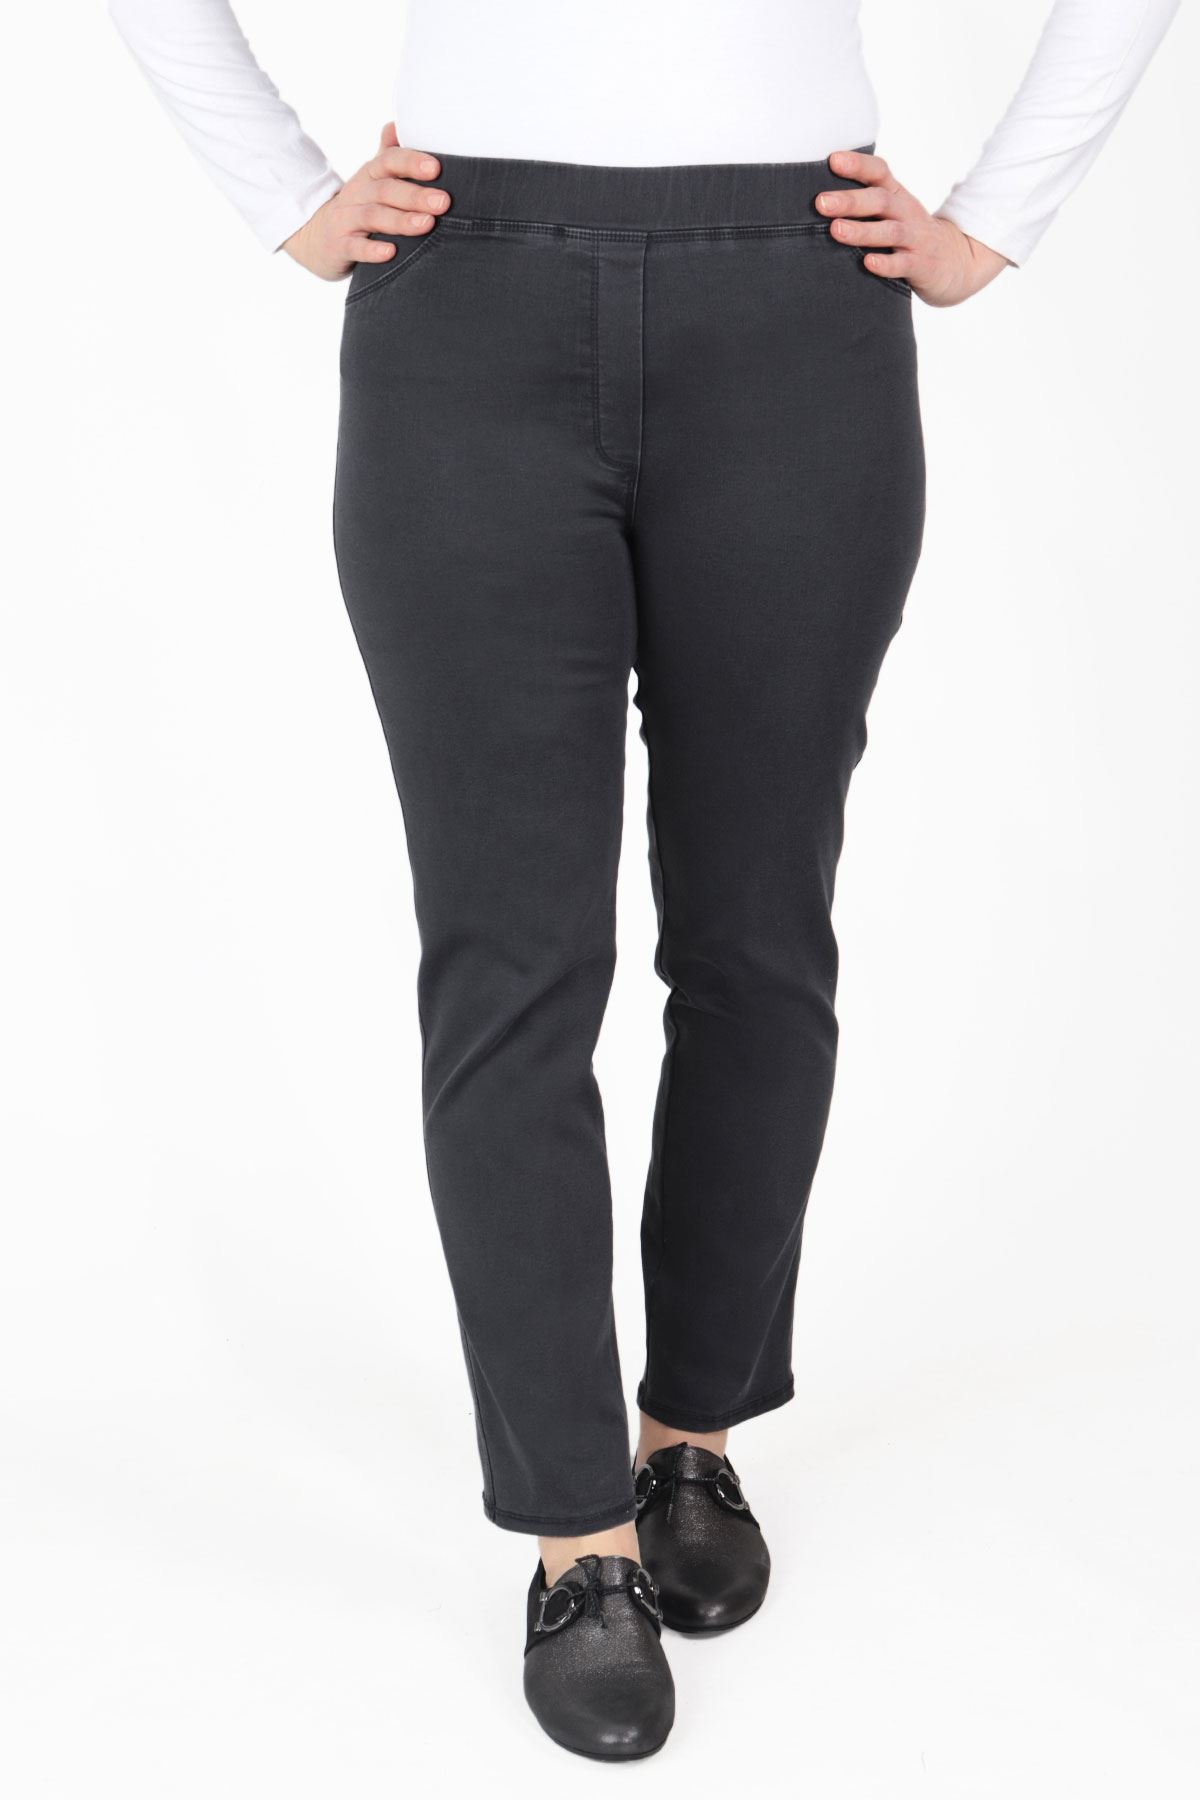 Büyük Beden Pantolon Füme B652